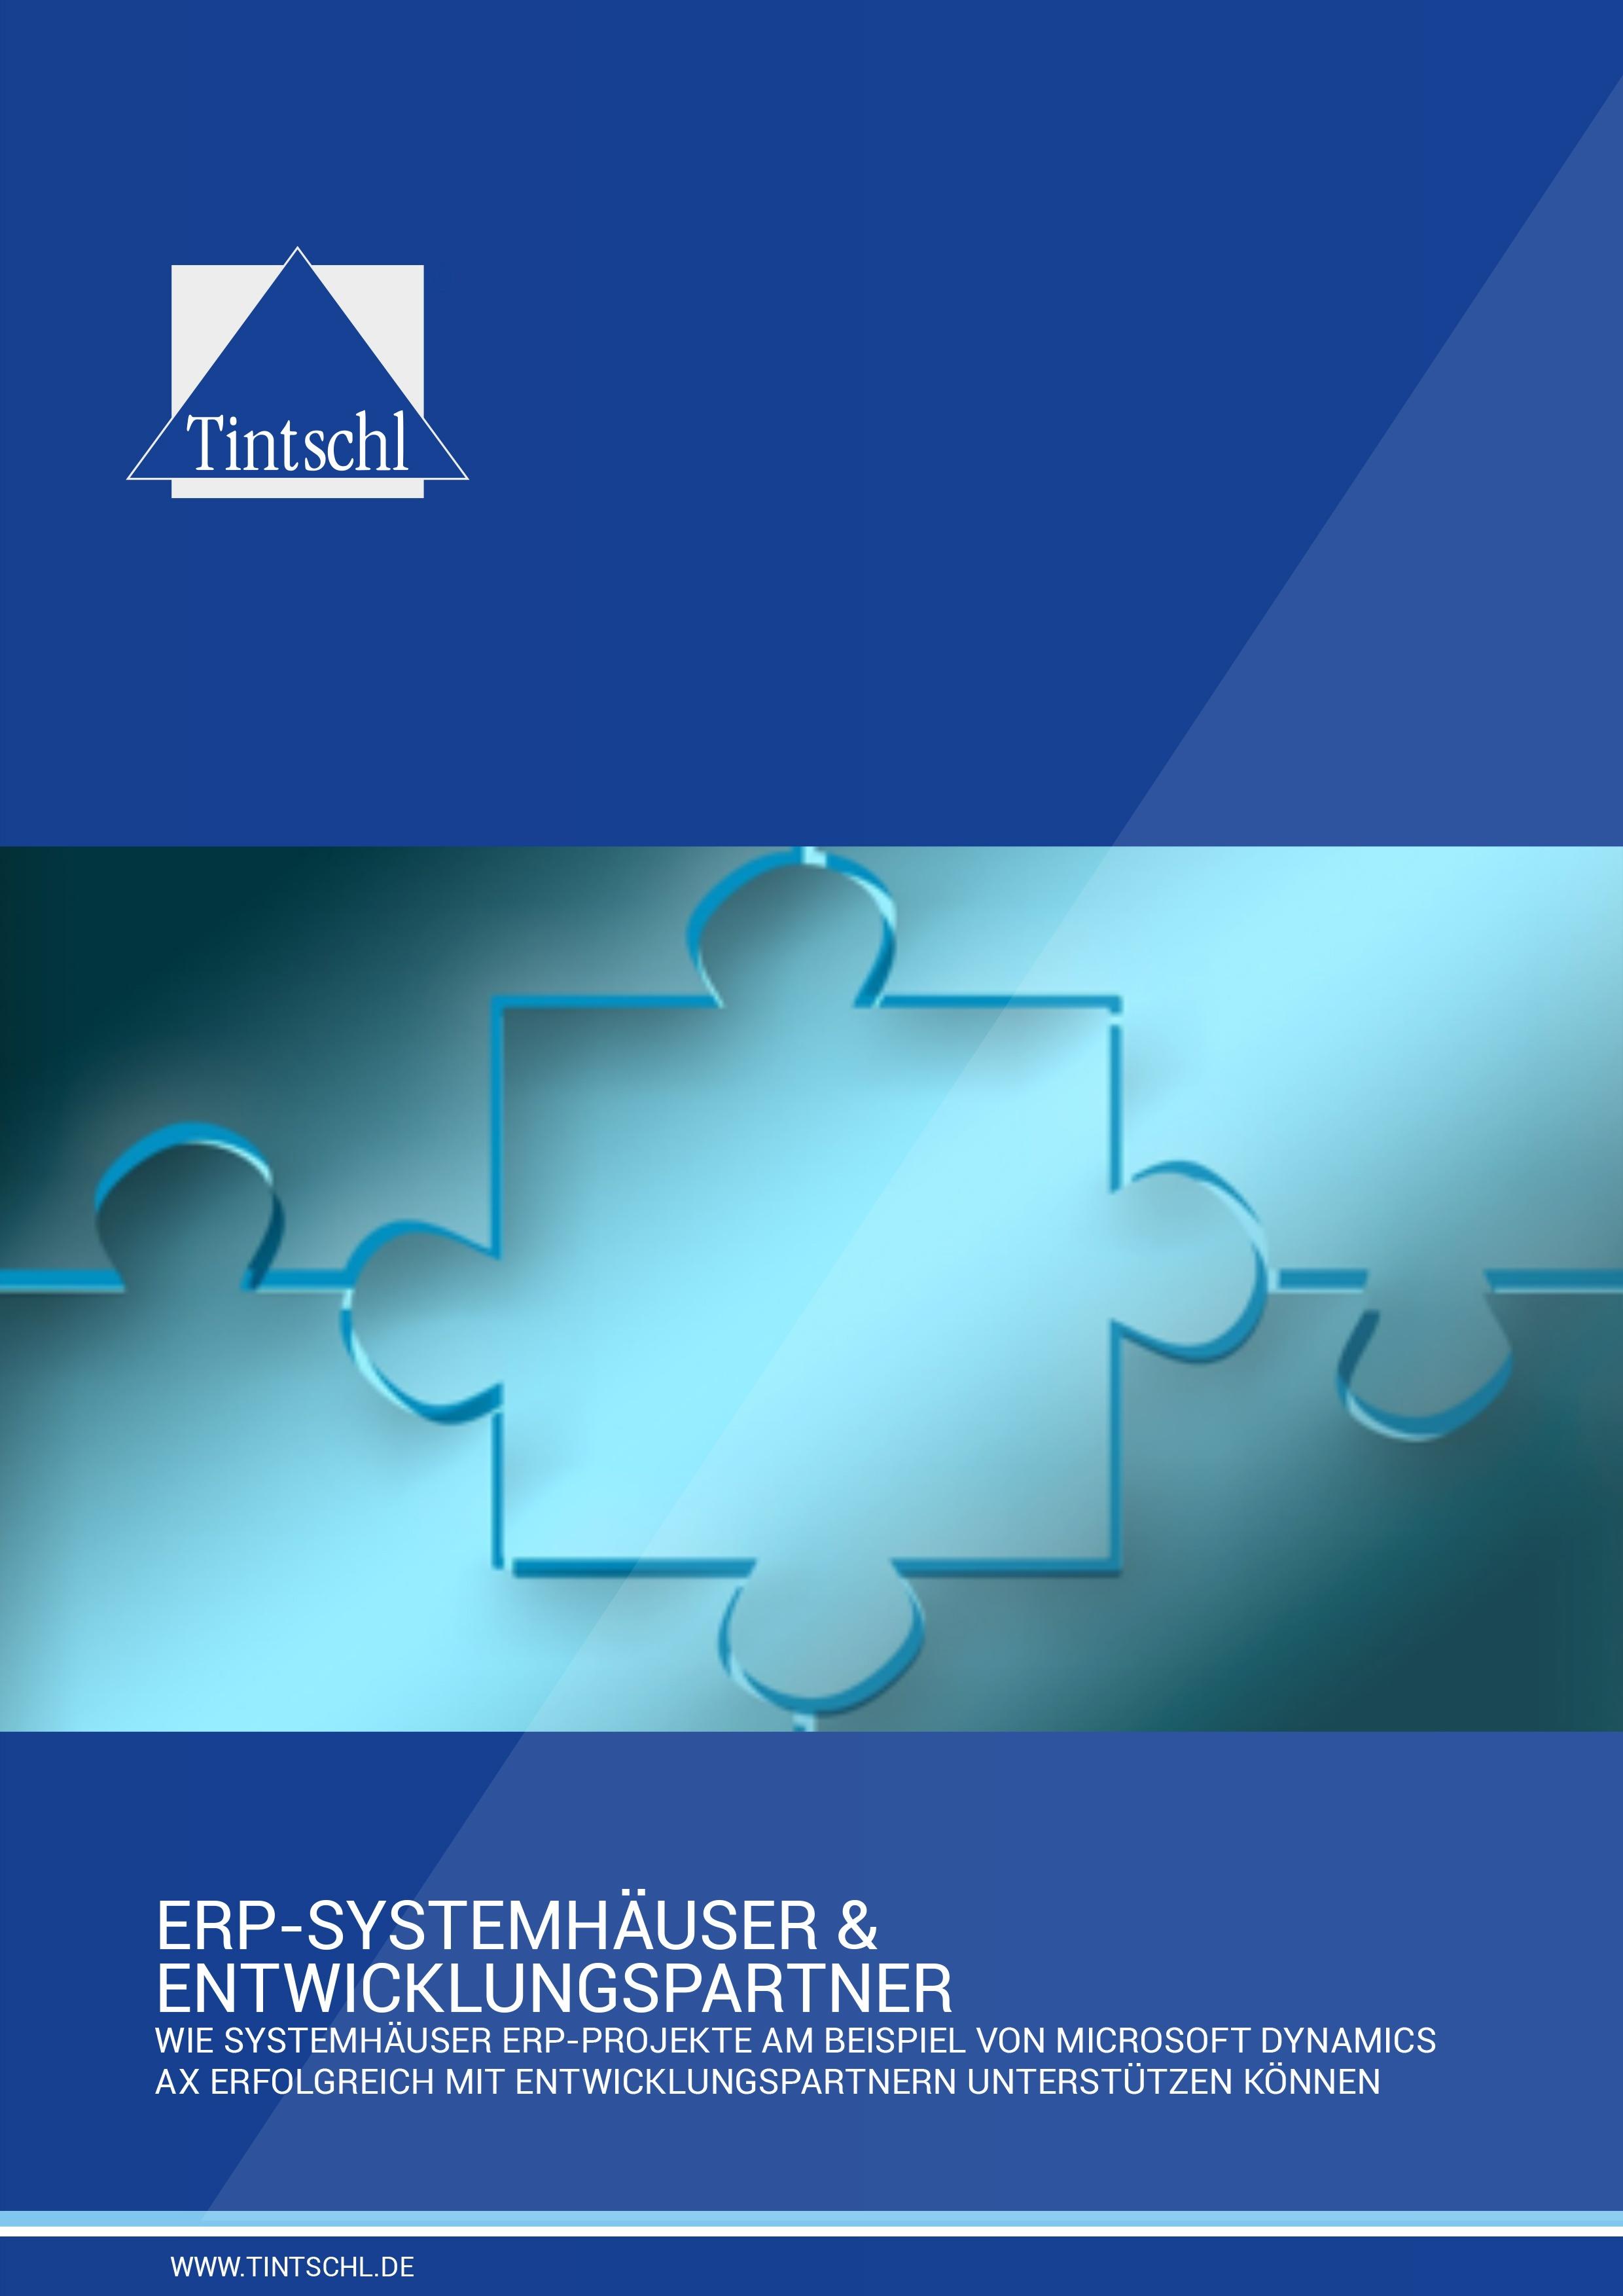 erp-systemhaeuser